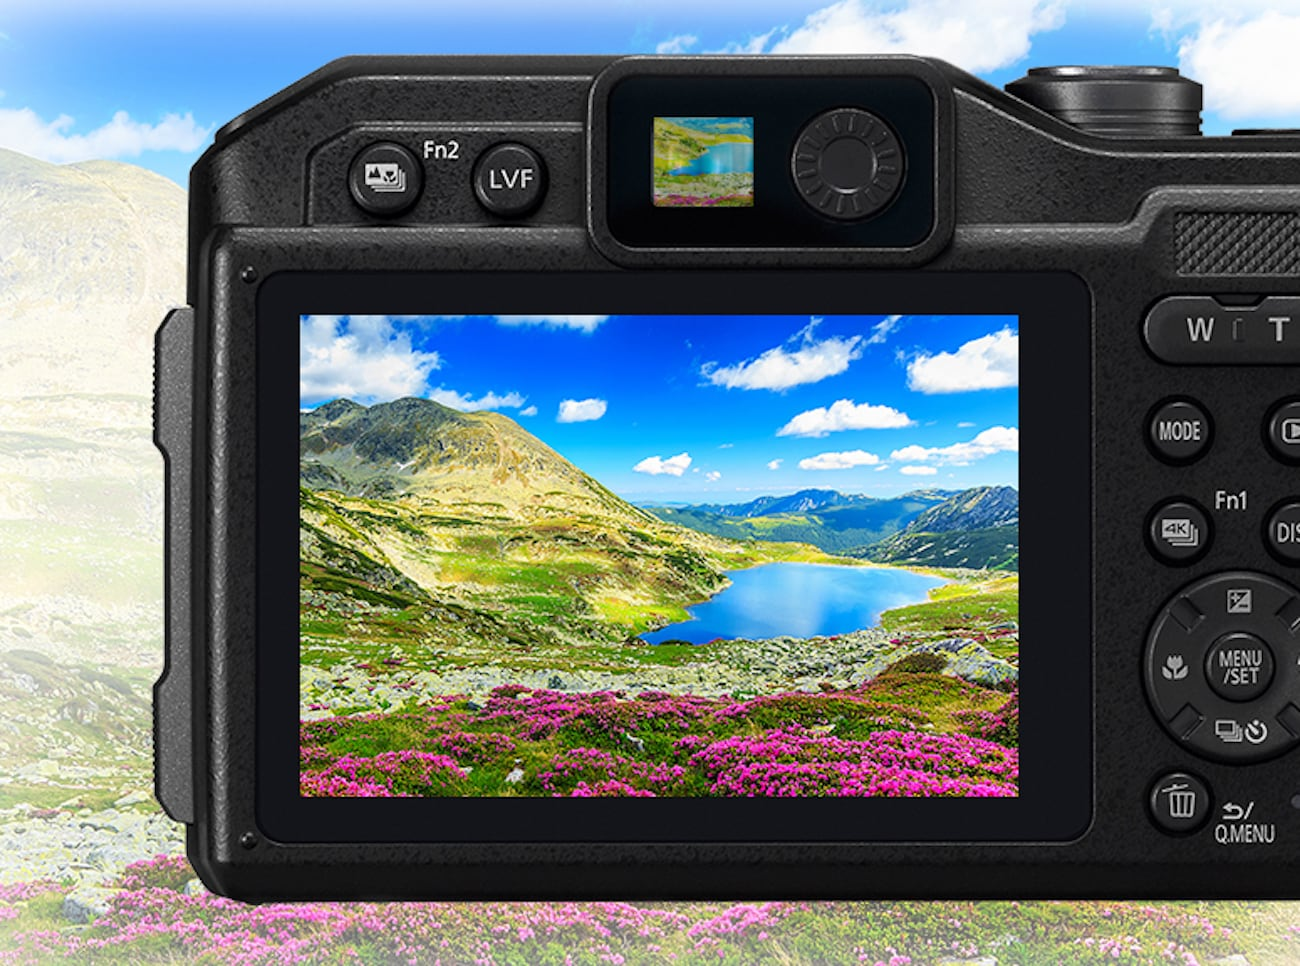 Panasonic LUMIX TS7 Waterproof Tough Digital Camera